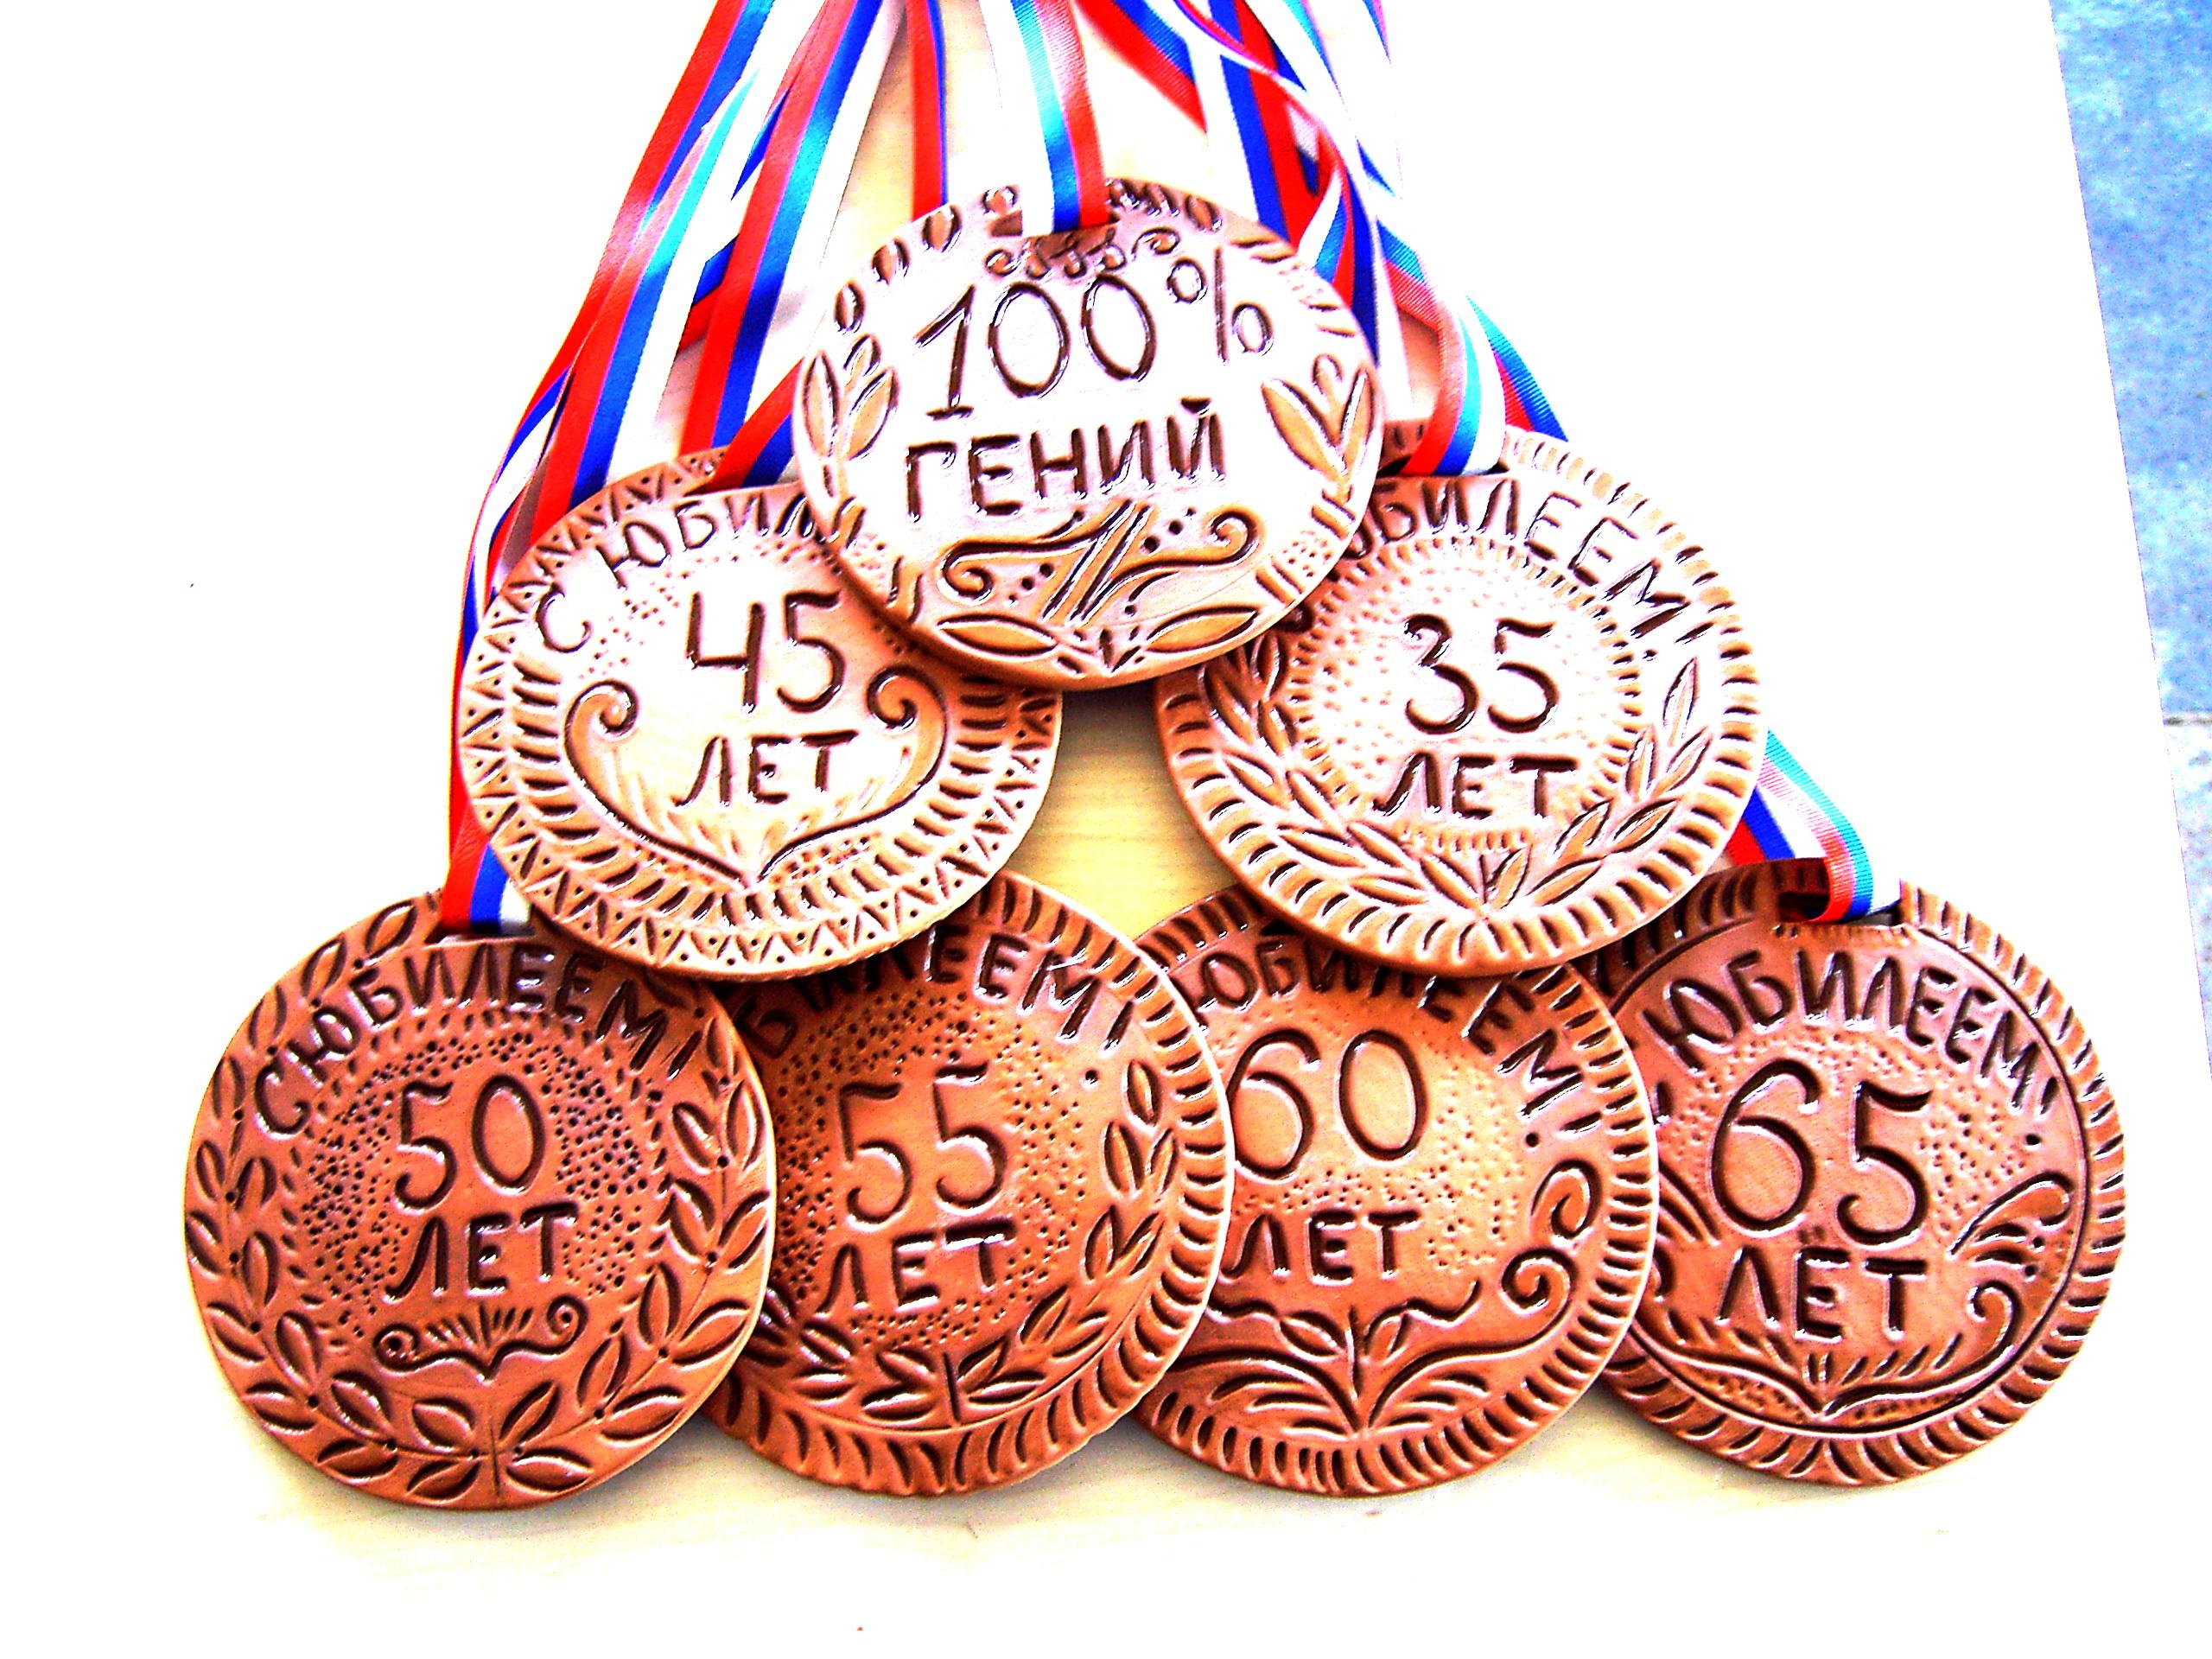 233Сув - Сувенирные Медали